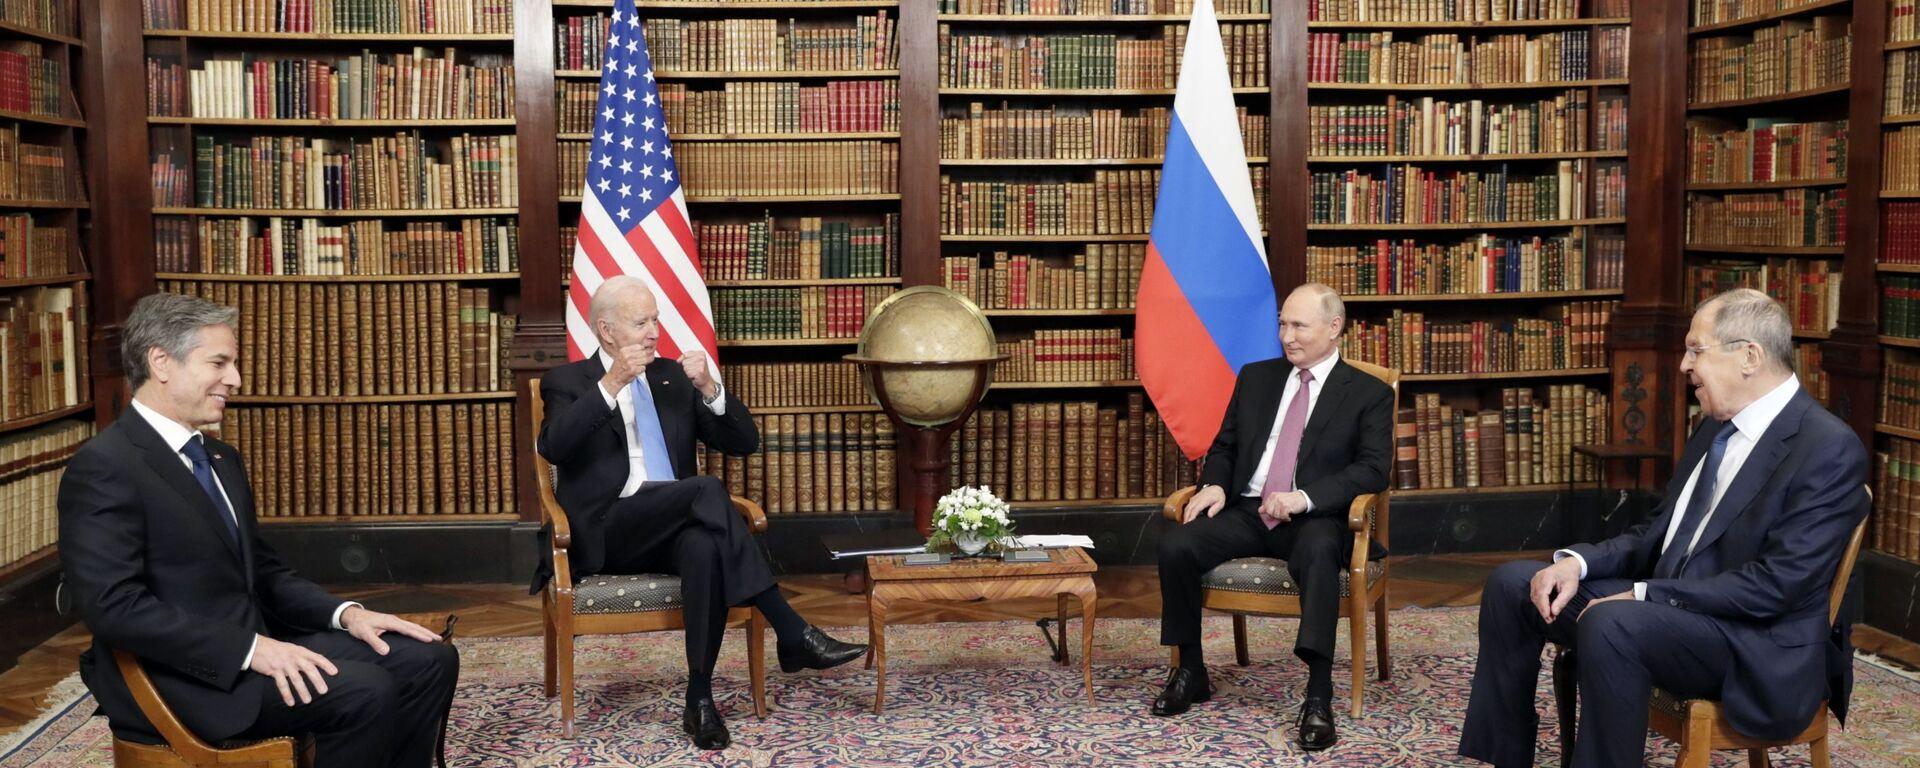 Президент РФ Владимир Путин и президент США Джо Байден во время встречи в Женеве на вилле Ла Гранж - Sputnik Italia, 1920, 18.06.2021